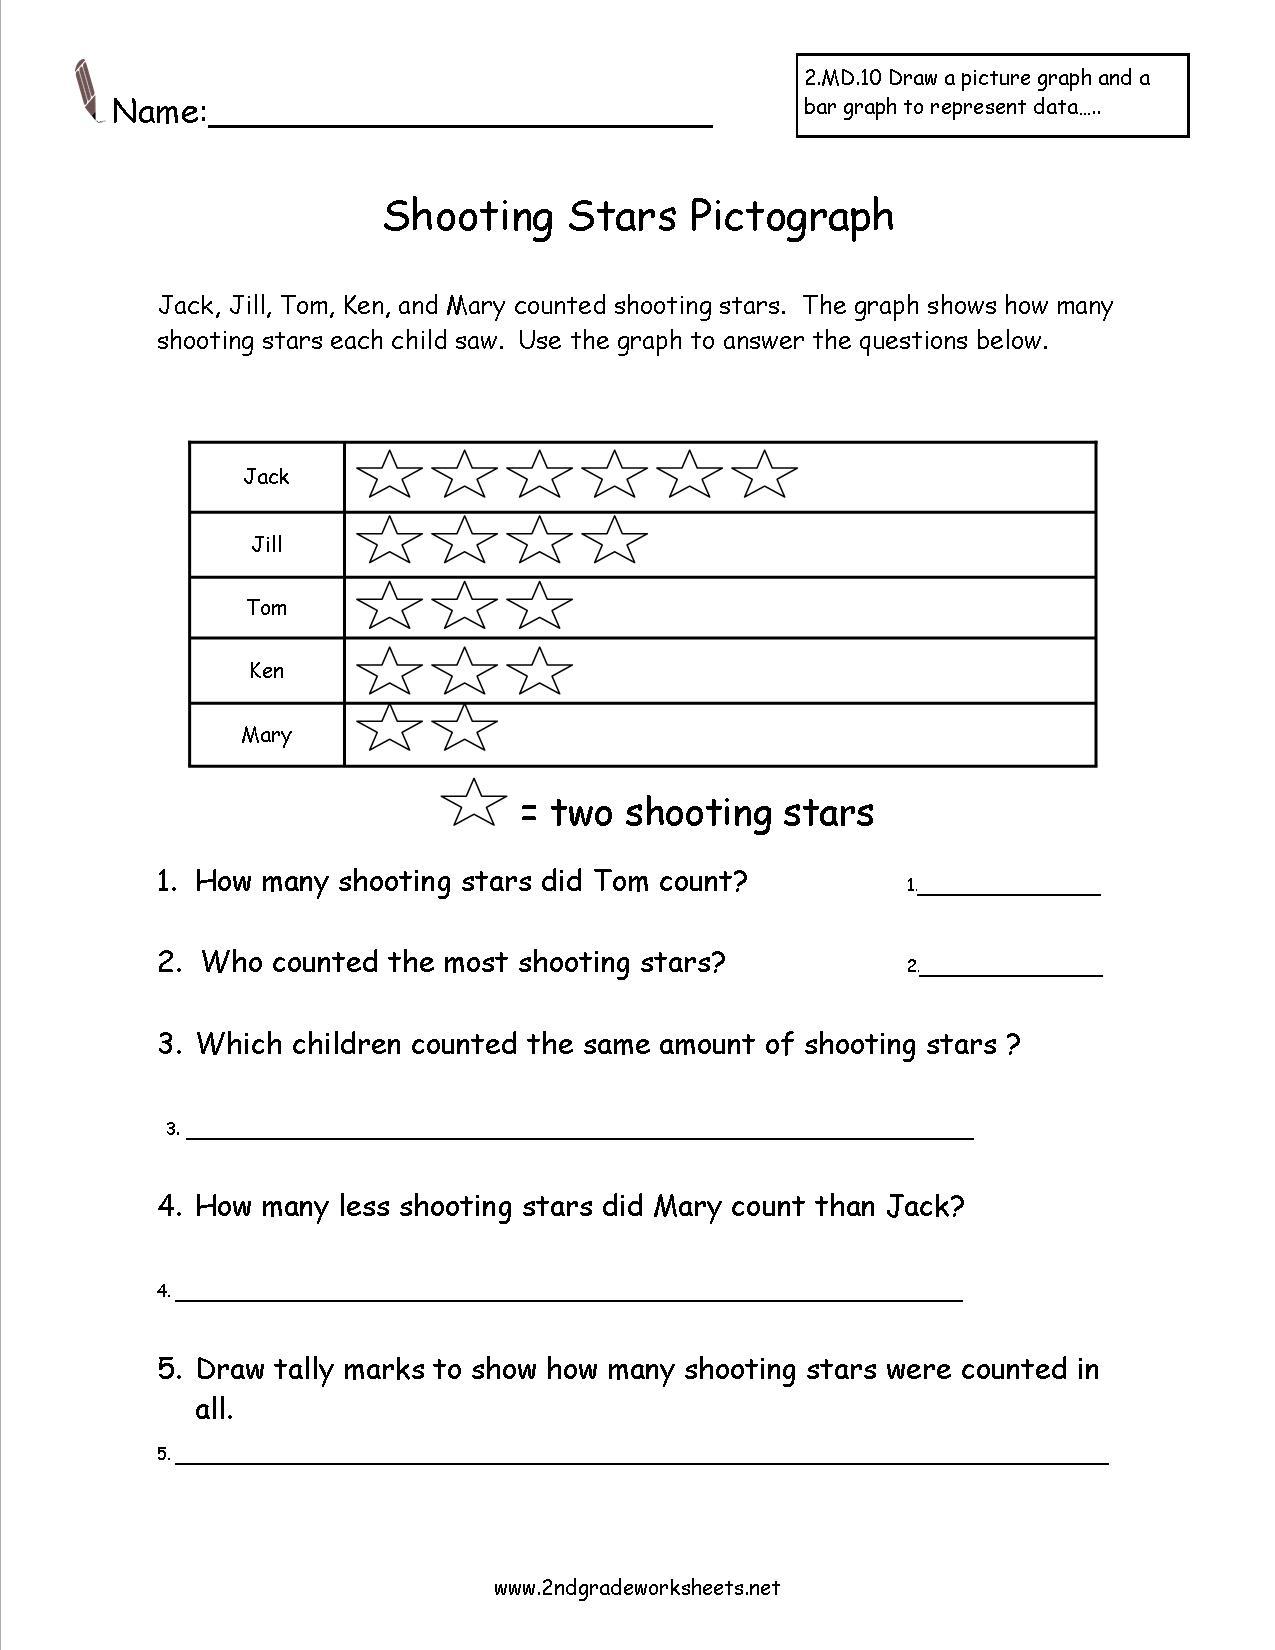 Free Printable Pictograph Worksheets For Kindergarten